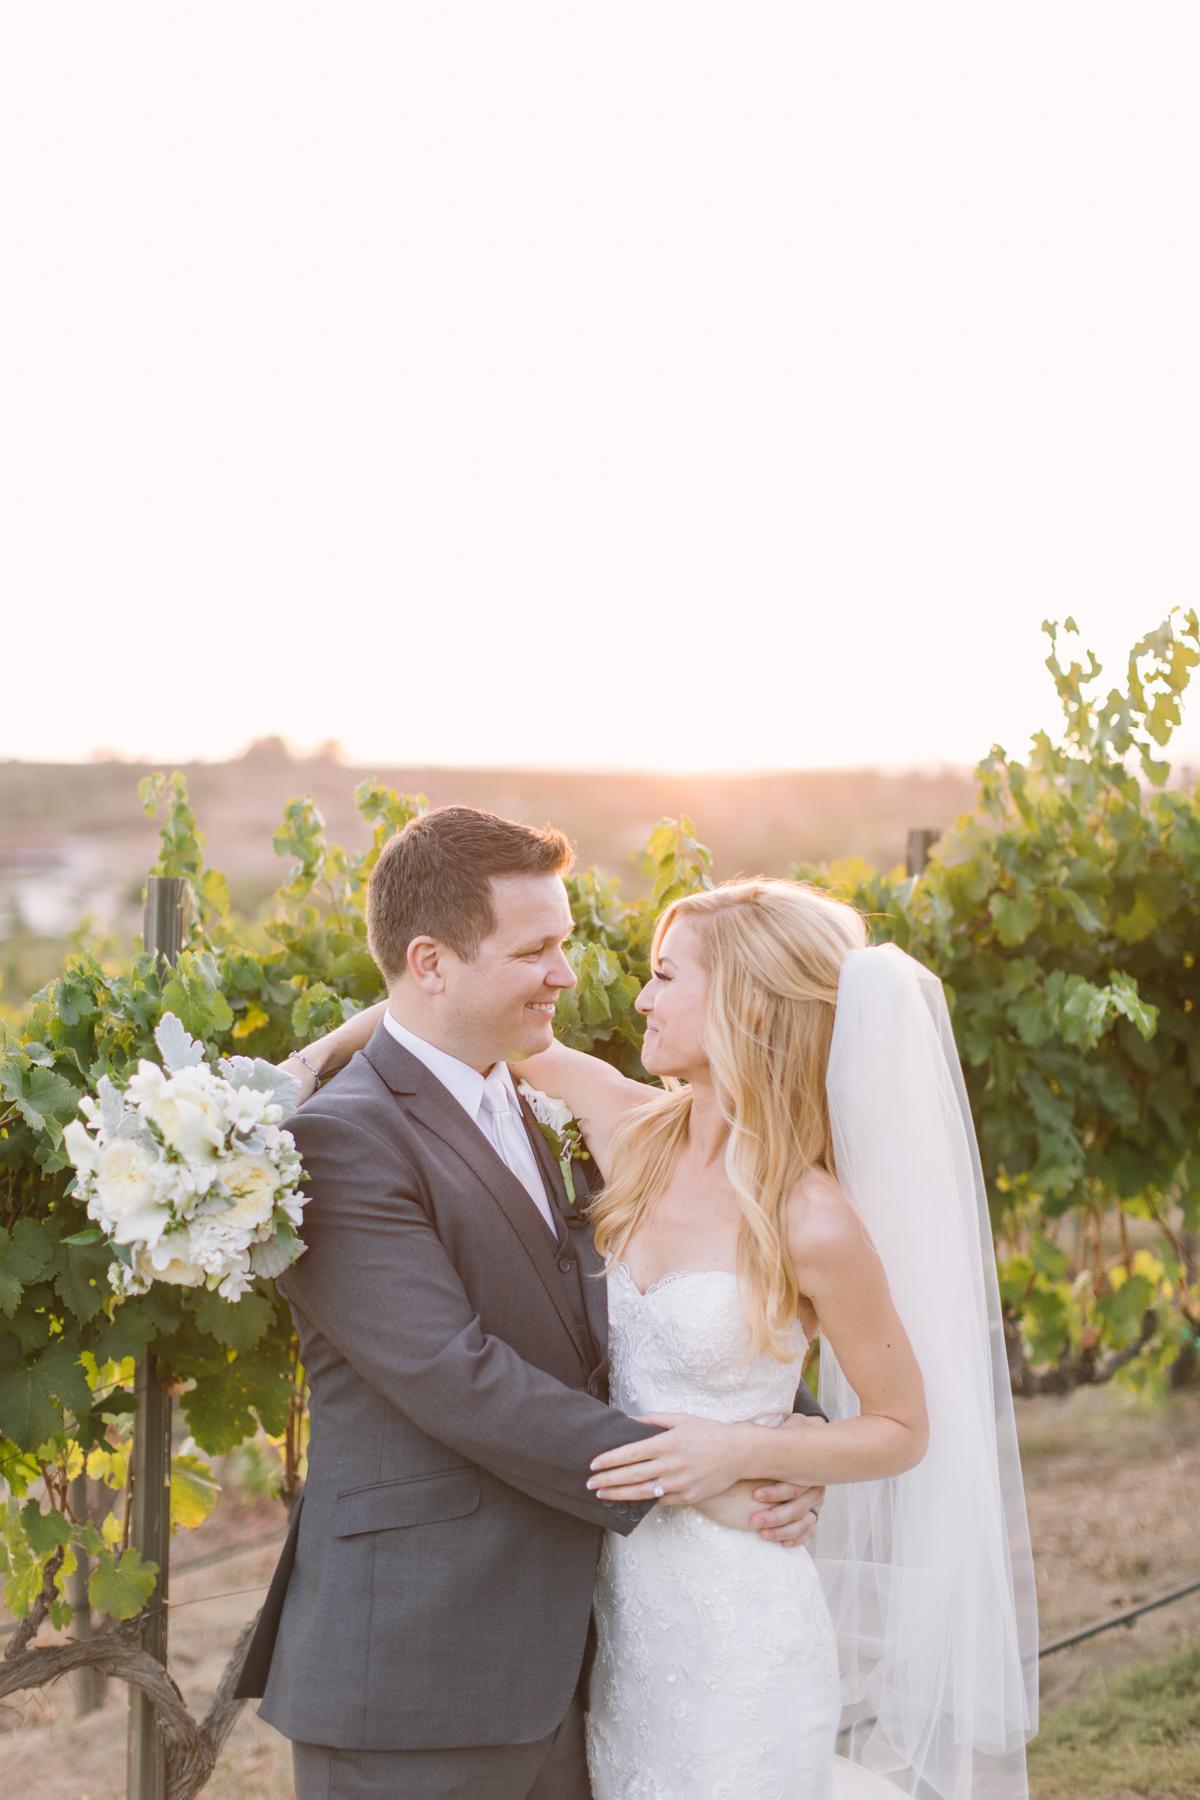 Orange-County-Wedding-Photography-Brianna-Caster-and-Co-Photographers-Falkner-Winery-Wedding-3